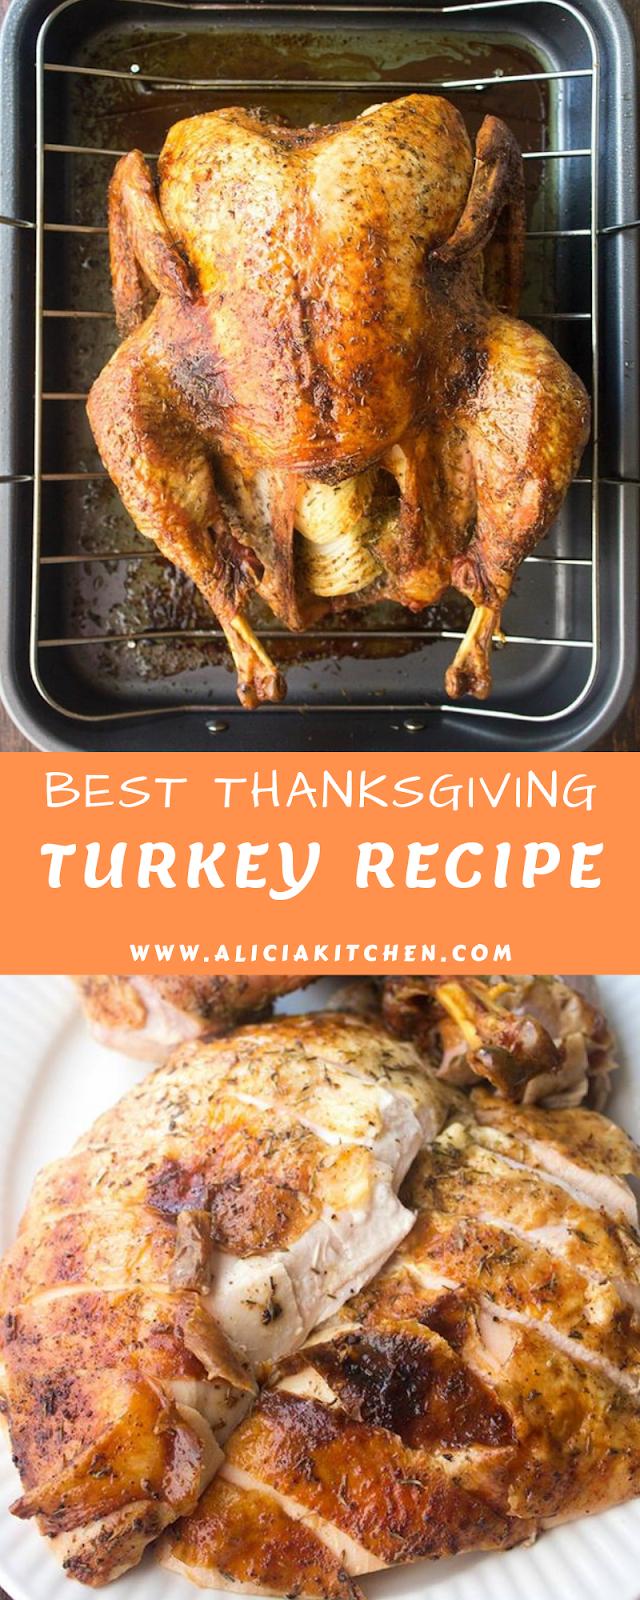 BEST THANKSGIVING TURKEY RECIPE (HOW TO COOK A TURKEY)